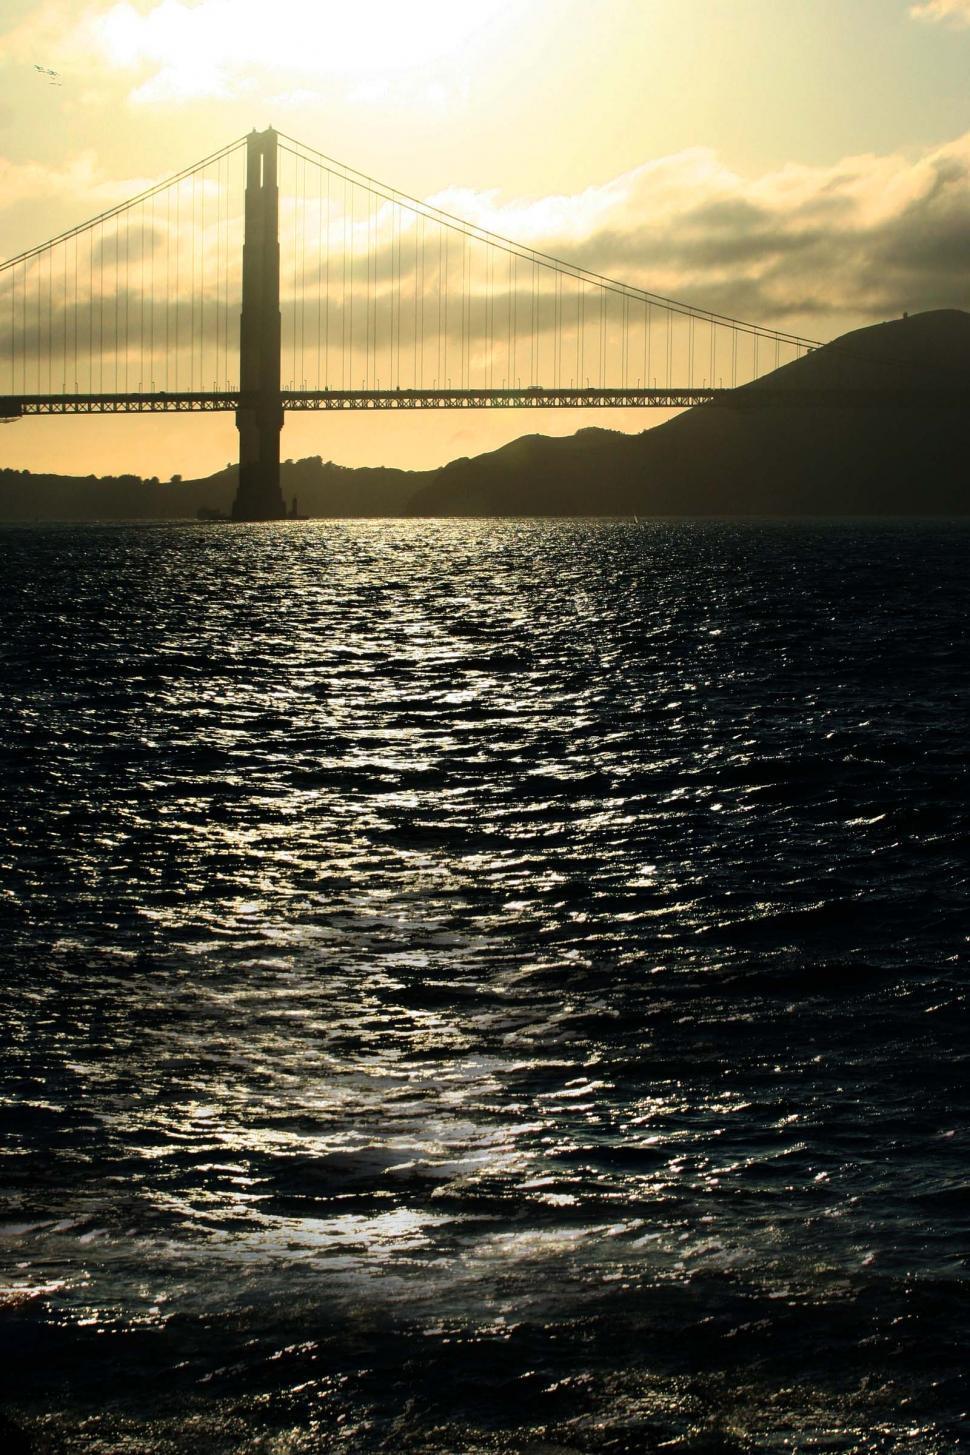 Download Free Stock HD Photo of Ocean, sunset, Golden Gate Online